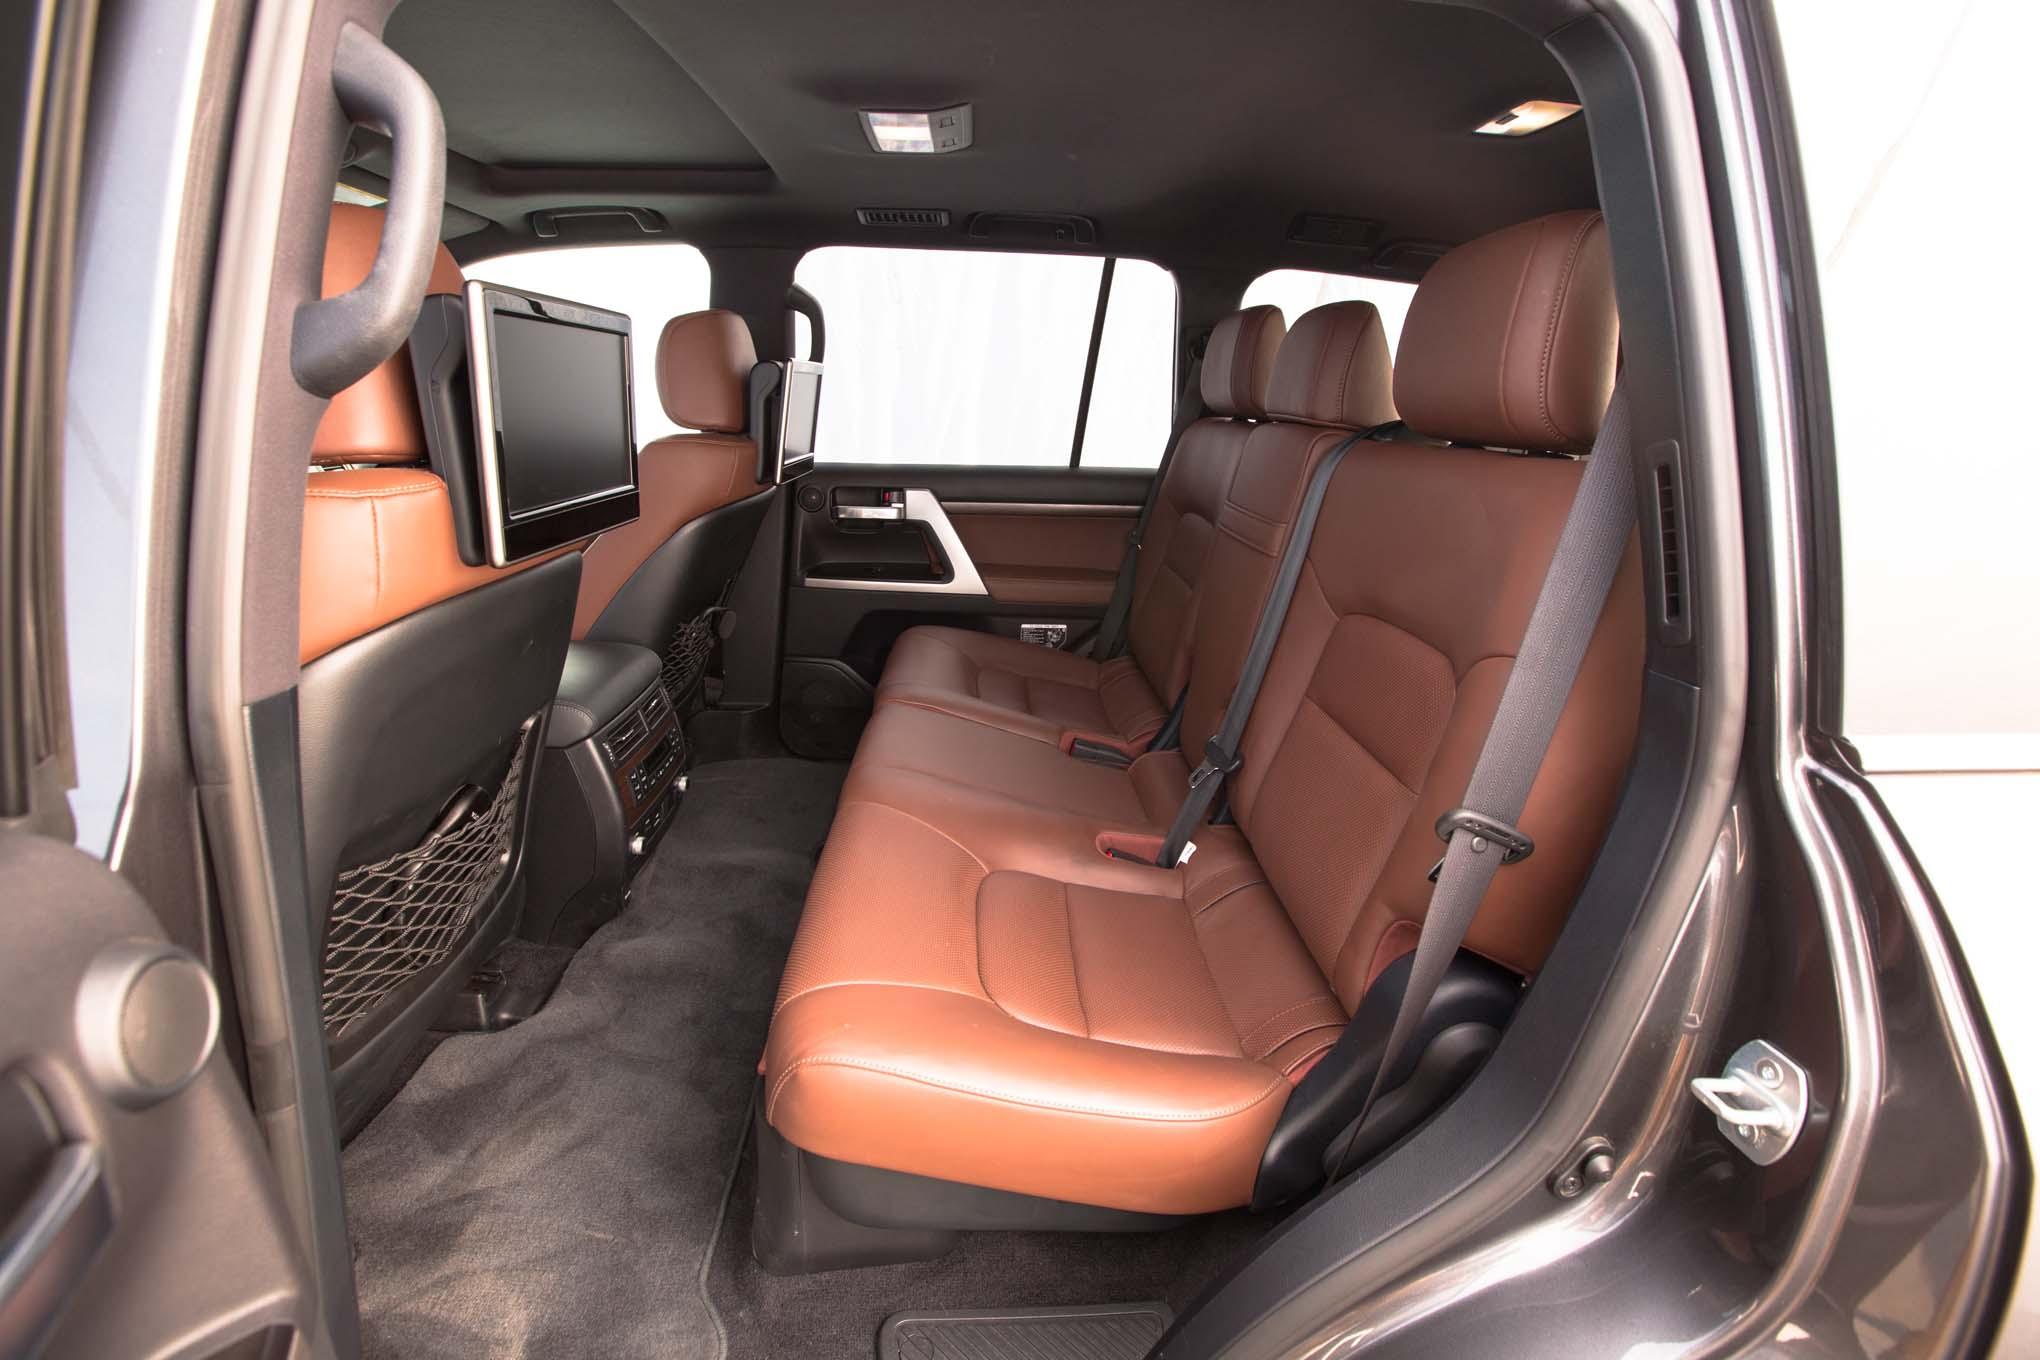 2016 Toyota Land Cruiser Rear Interior Seats Motor Trend En Español